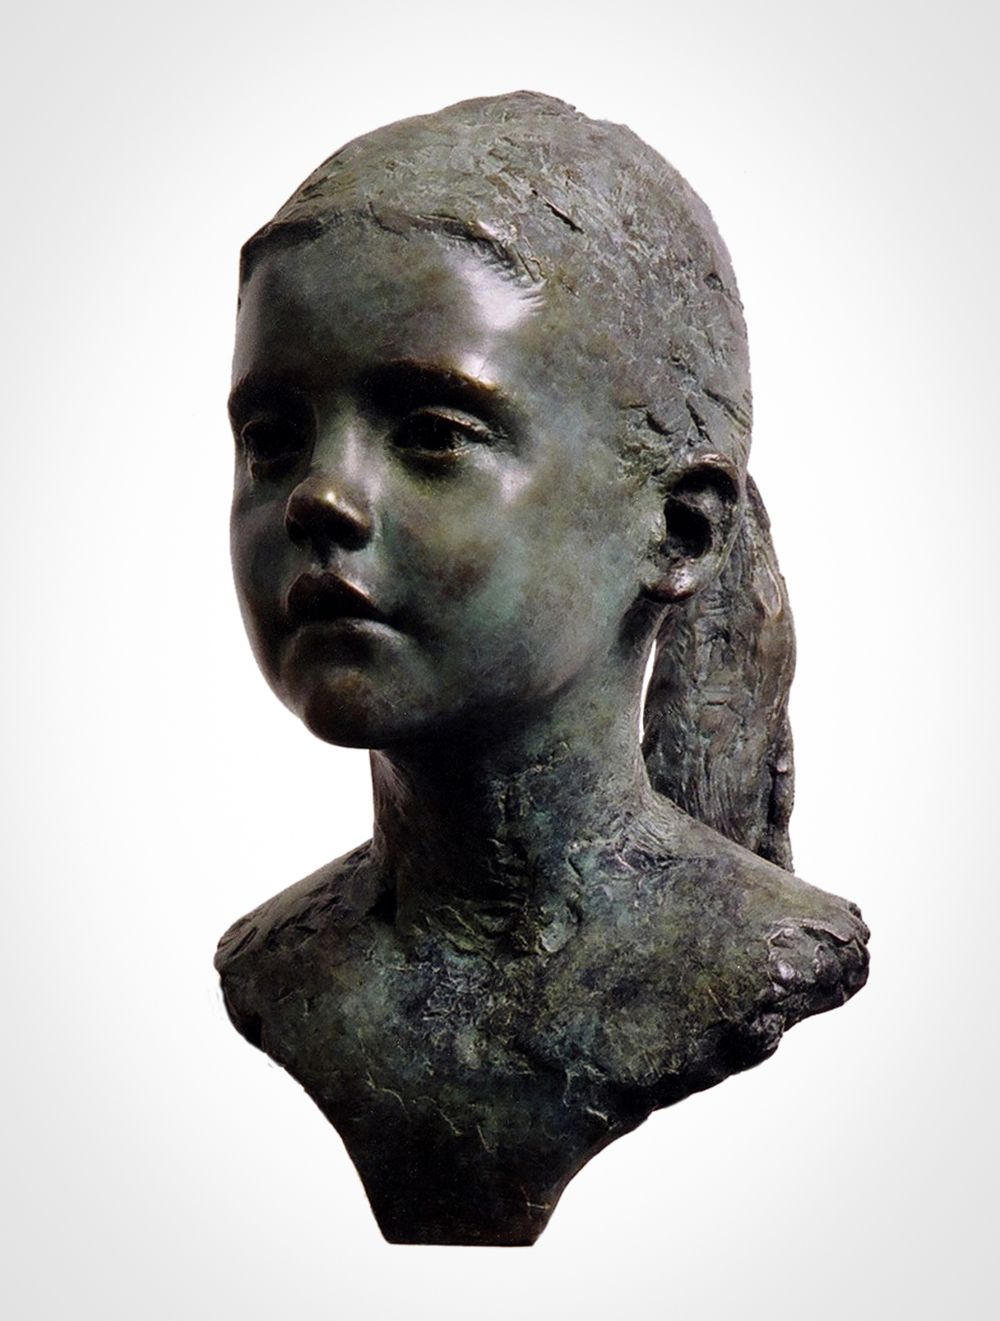 Human Figurative Sculptures - Sculptures for sale - Page